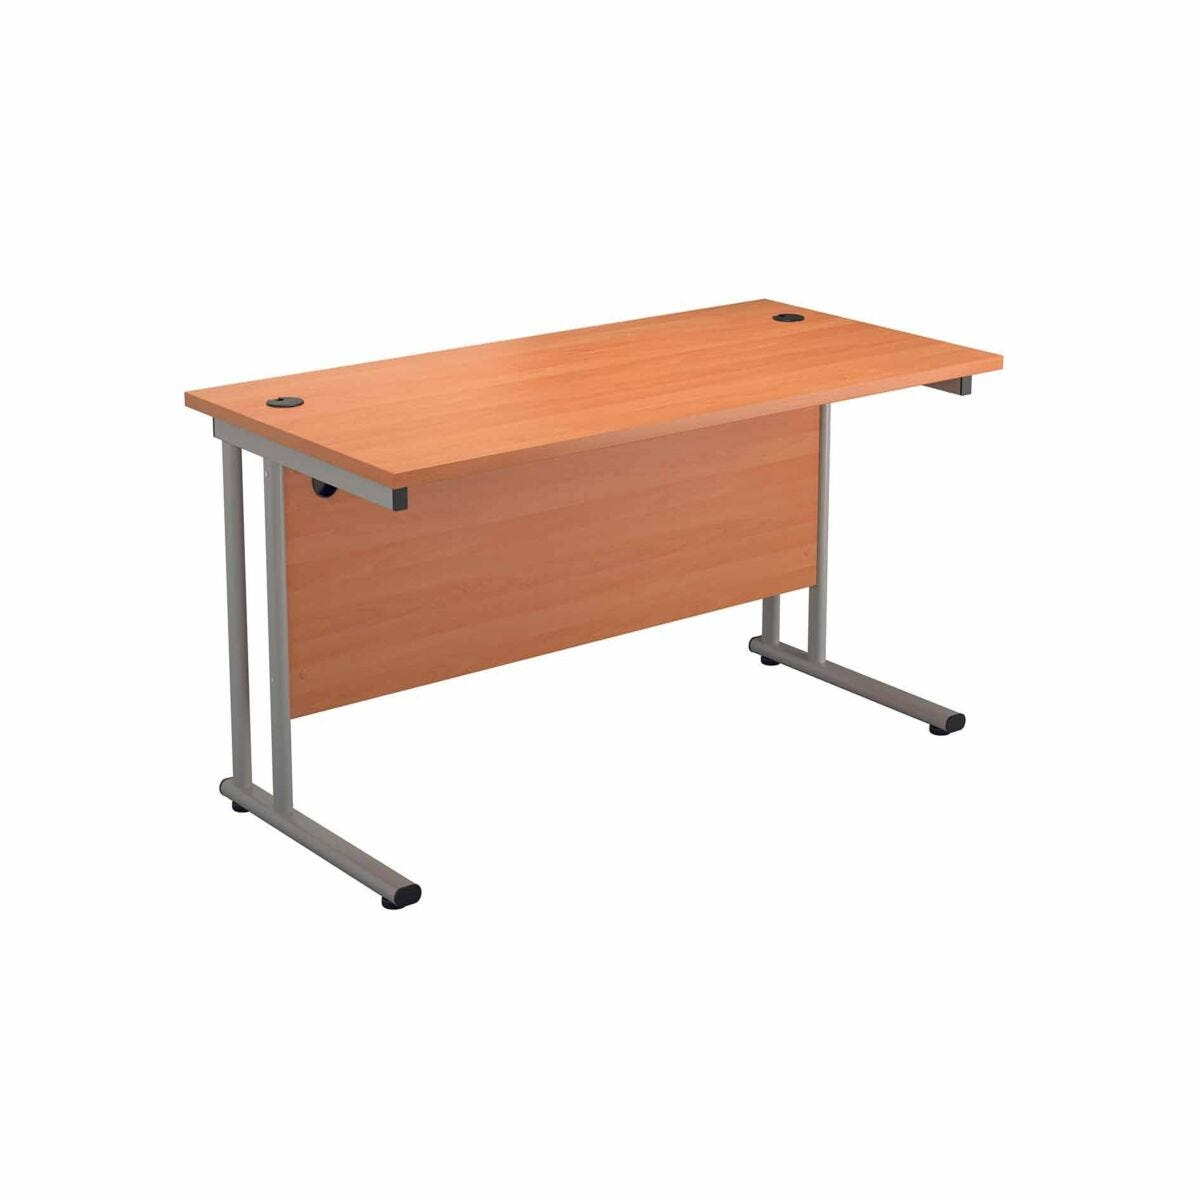 TC Office Start Silver Cantilever Frame Desk 1800x800mm